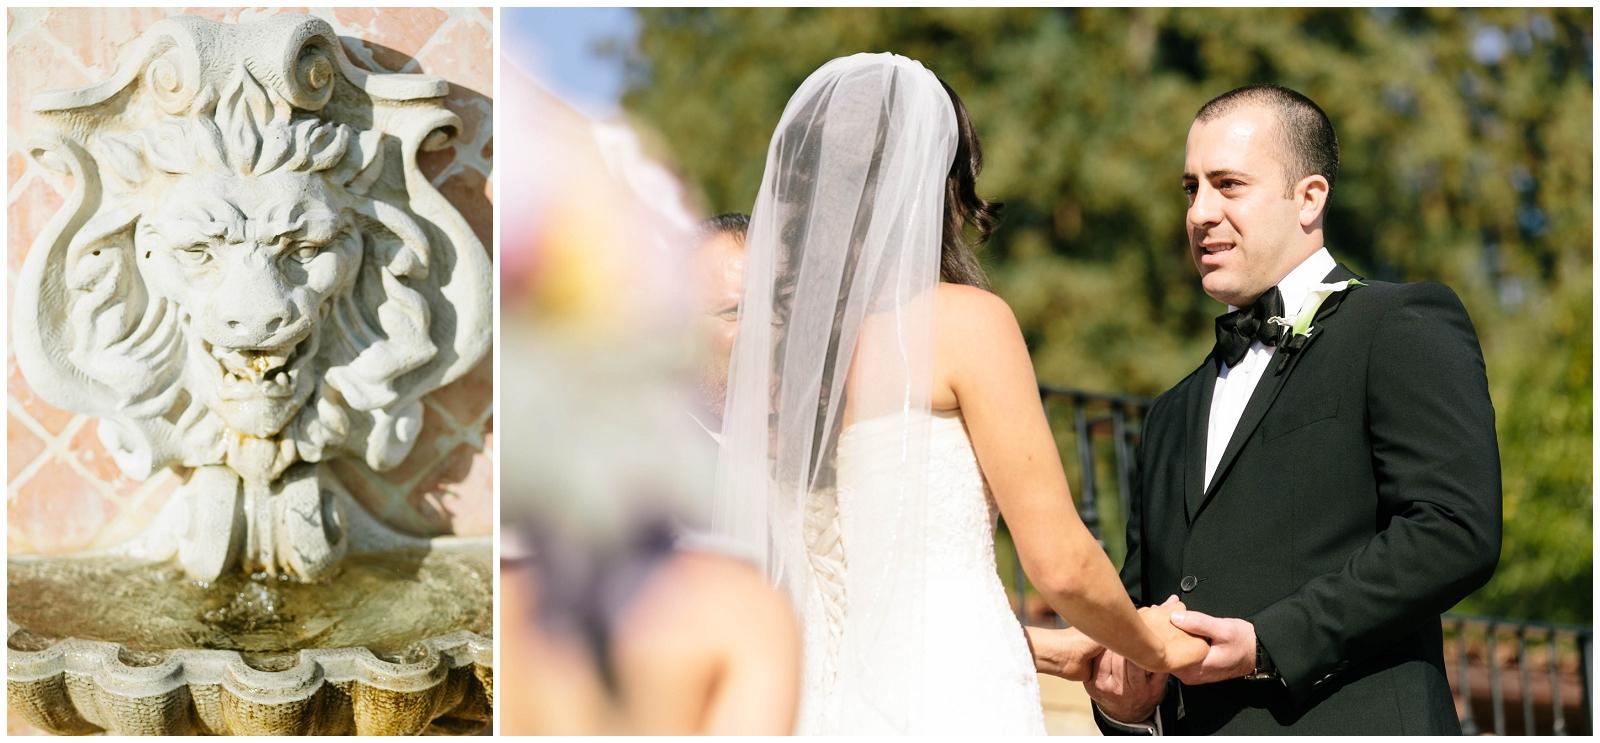 San-Francisco-Bay-Area-Wedding-Photography-Kennolyn-9.jpg